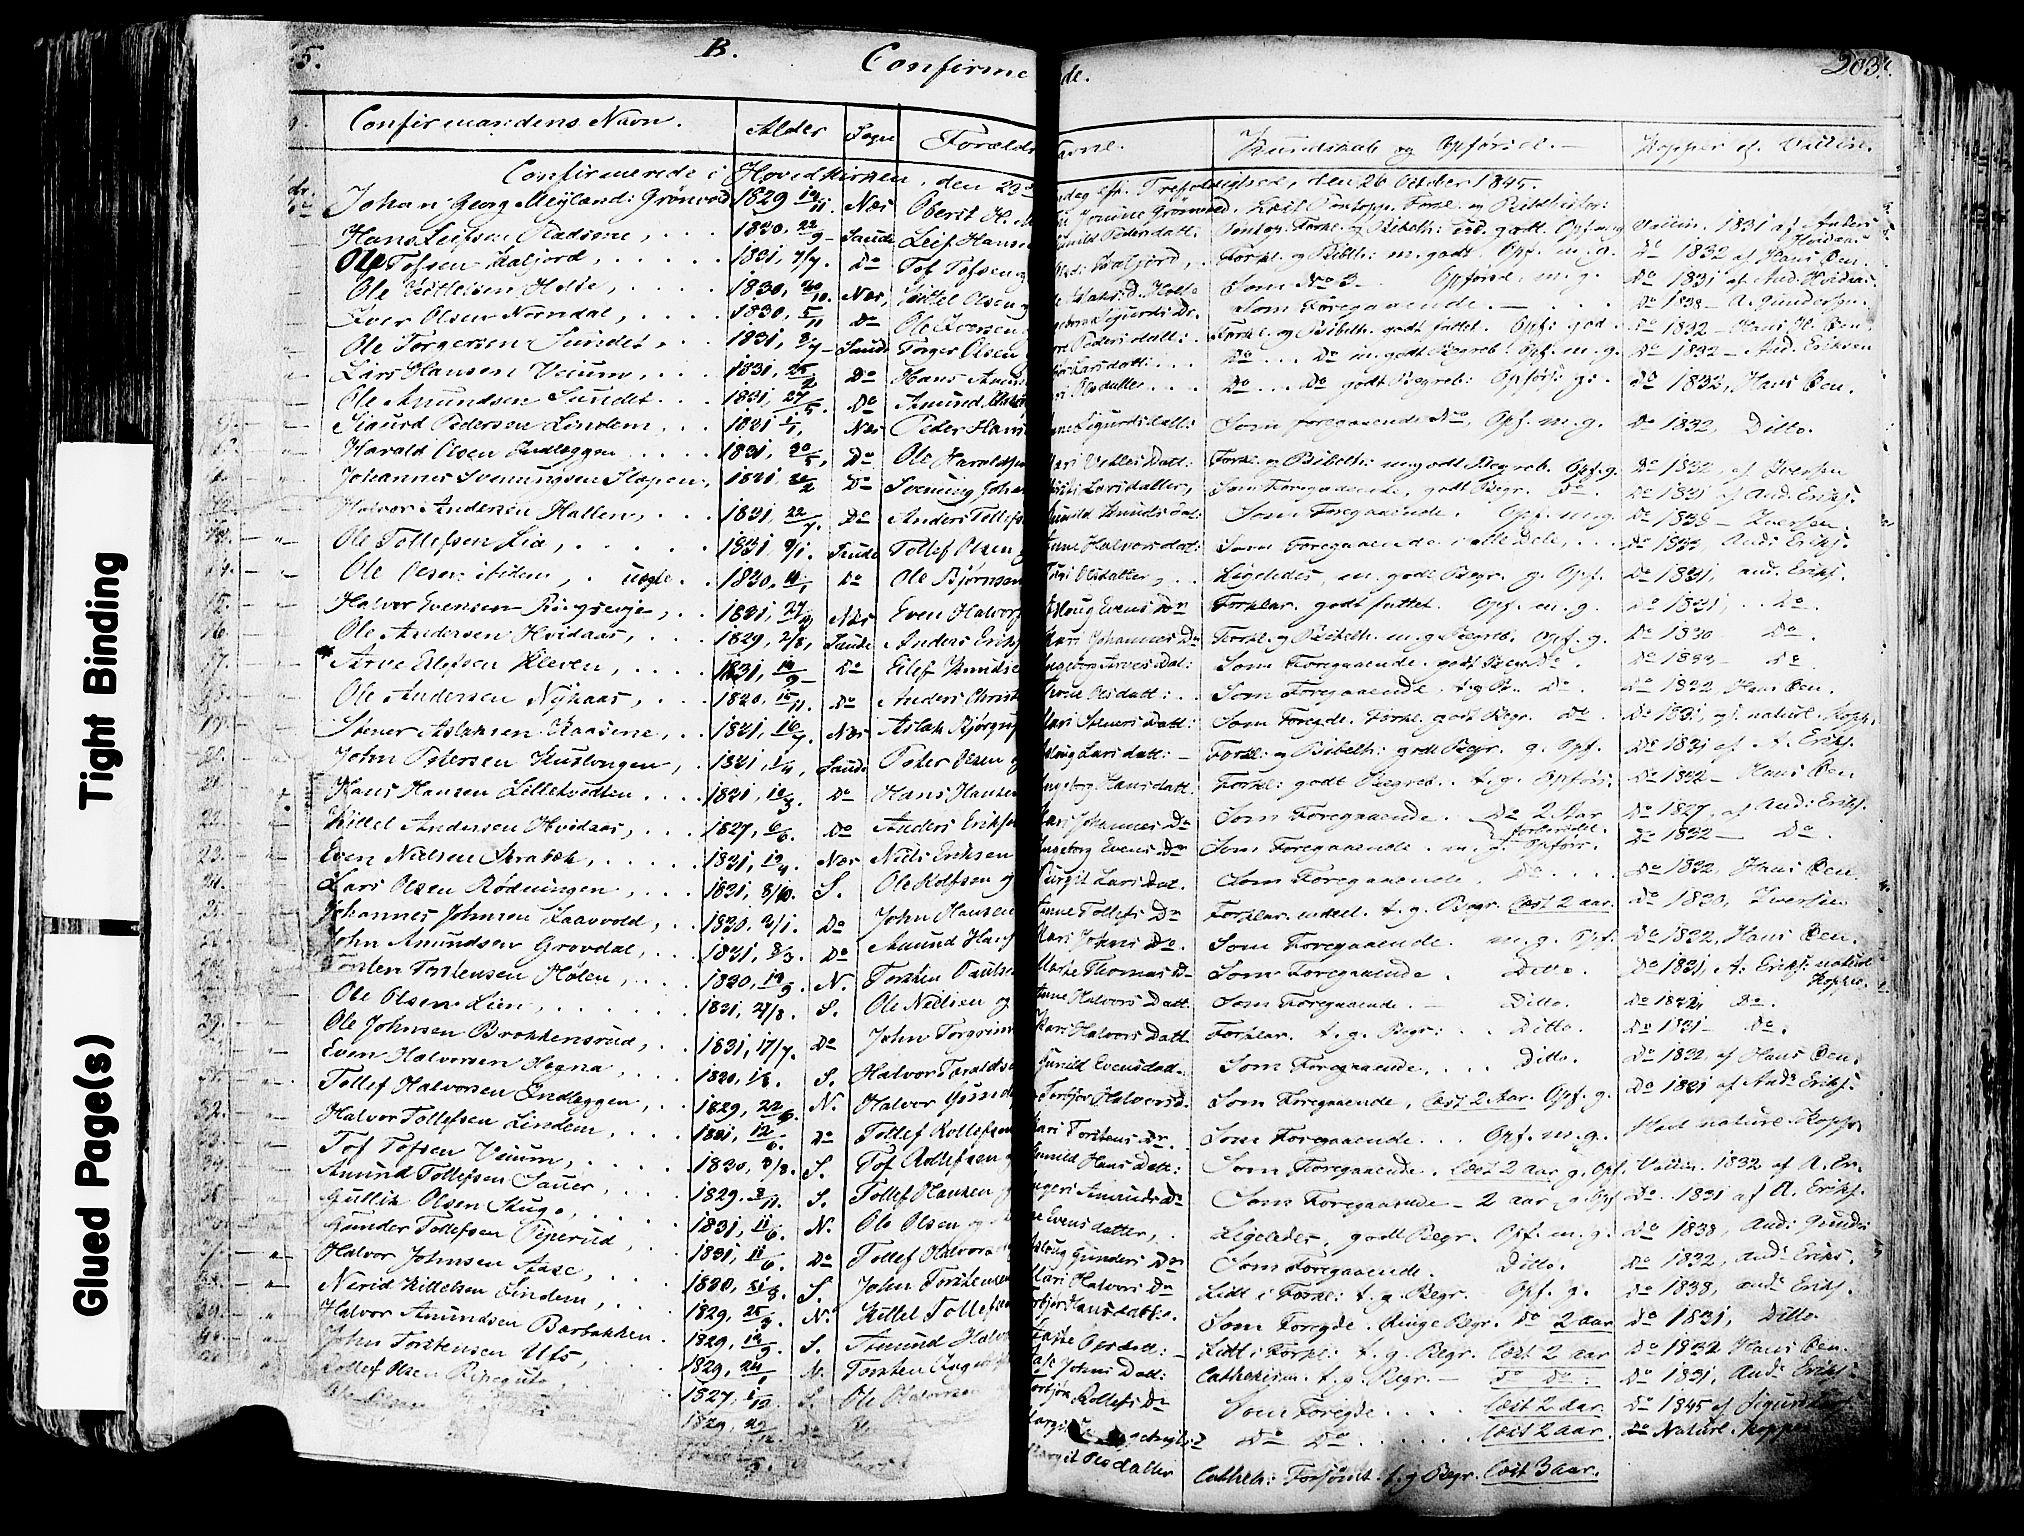 SAKO, Sauherad kirkebøker, F/Fa/L0006: Ministerialbok nr. I 6, 1827-1850, s. 203